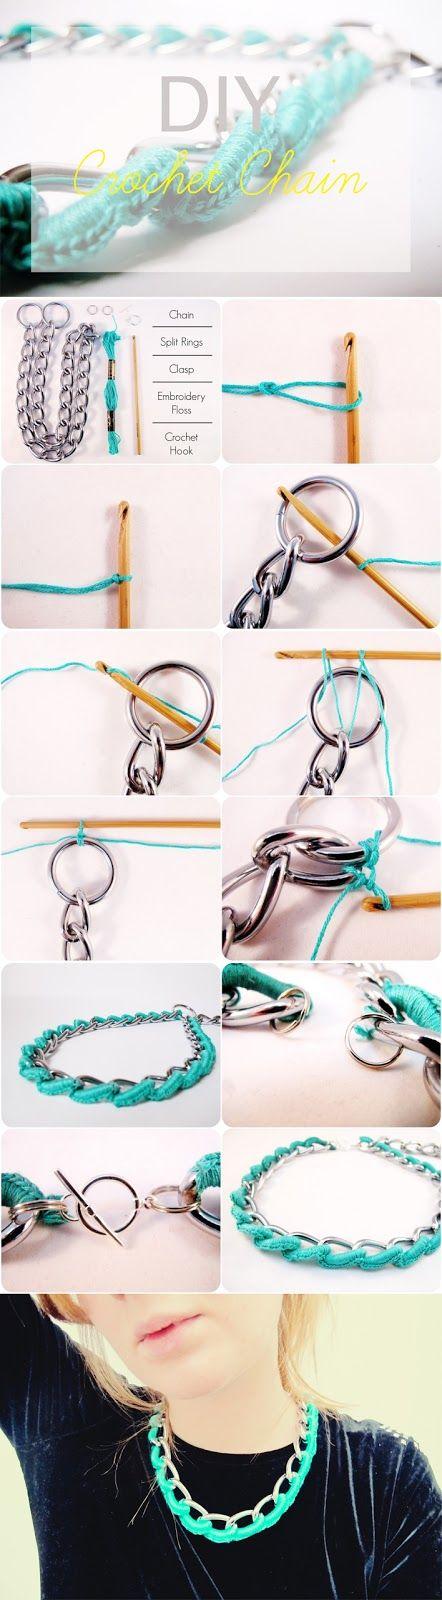 teahab: DIY: Embellish